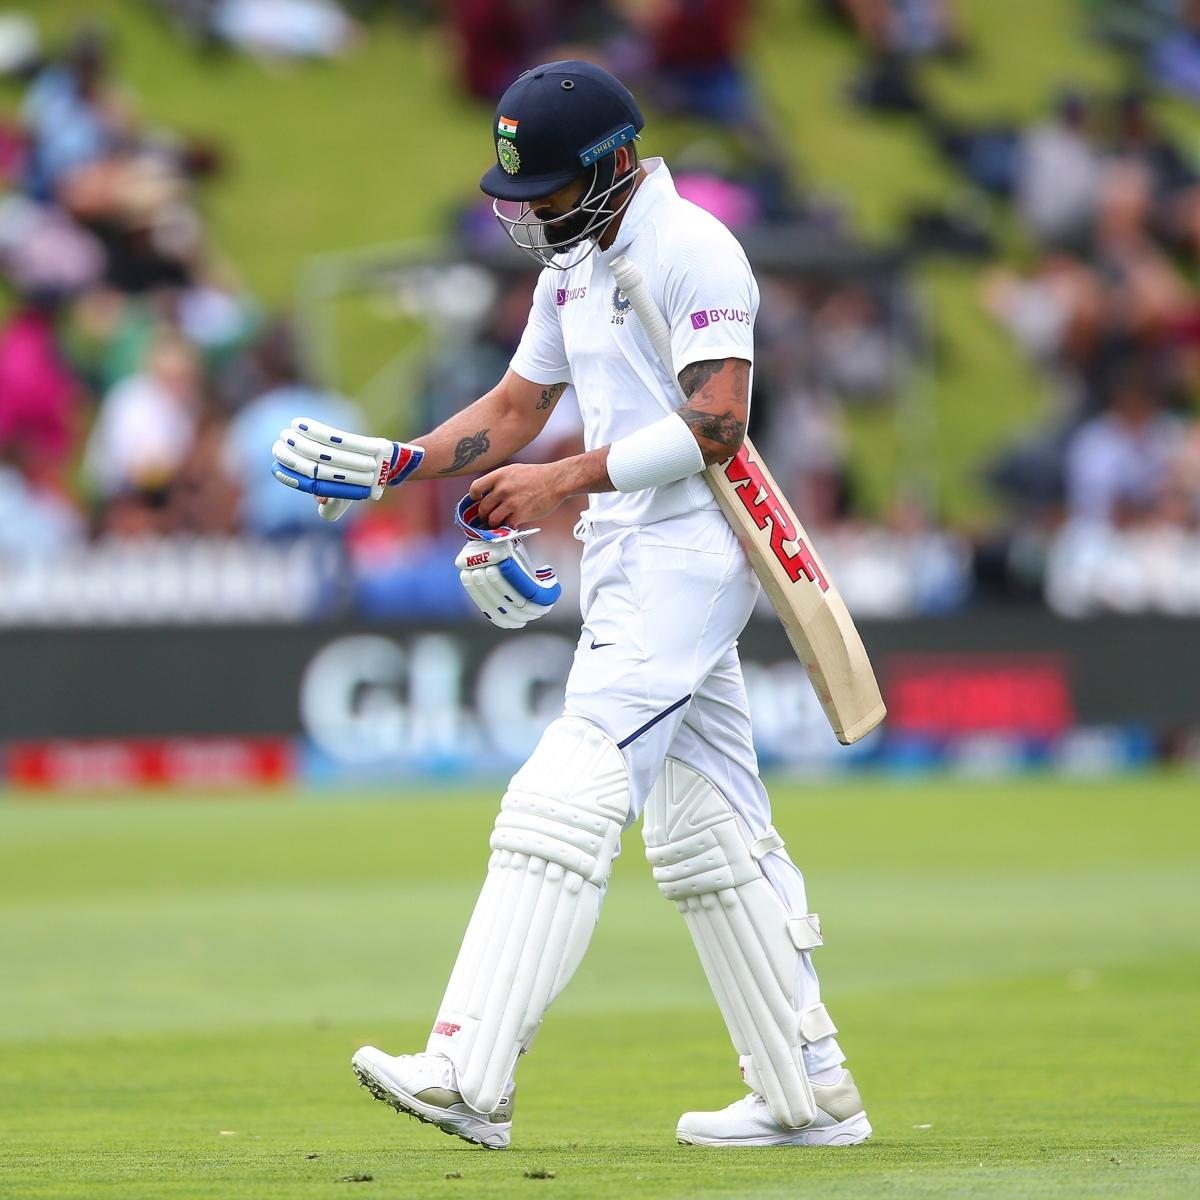 'These days Virat Kohli always beats my alarm clock': Twitter worried as skipper flops again against New Zealand